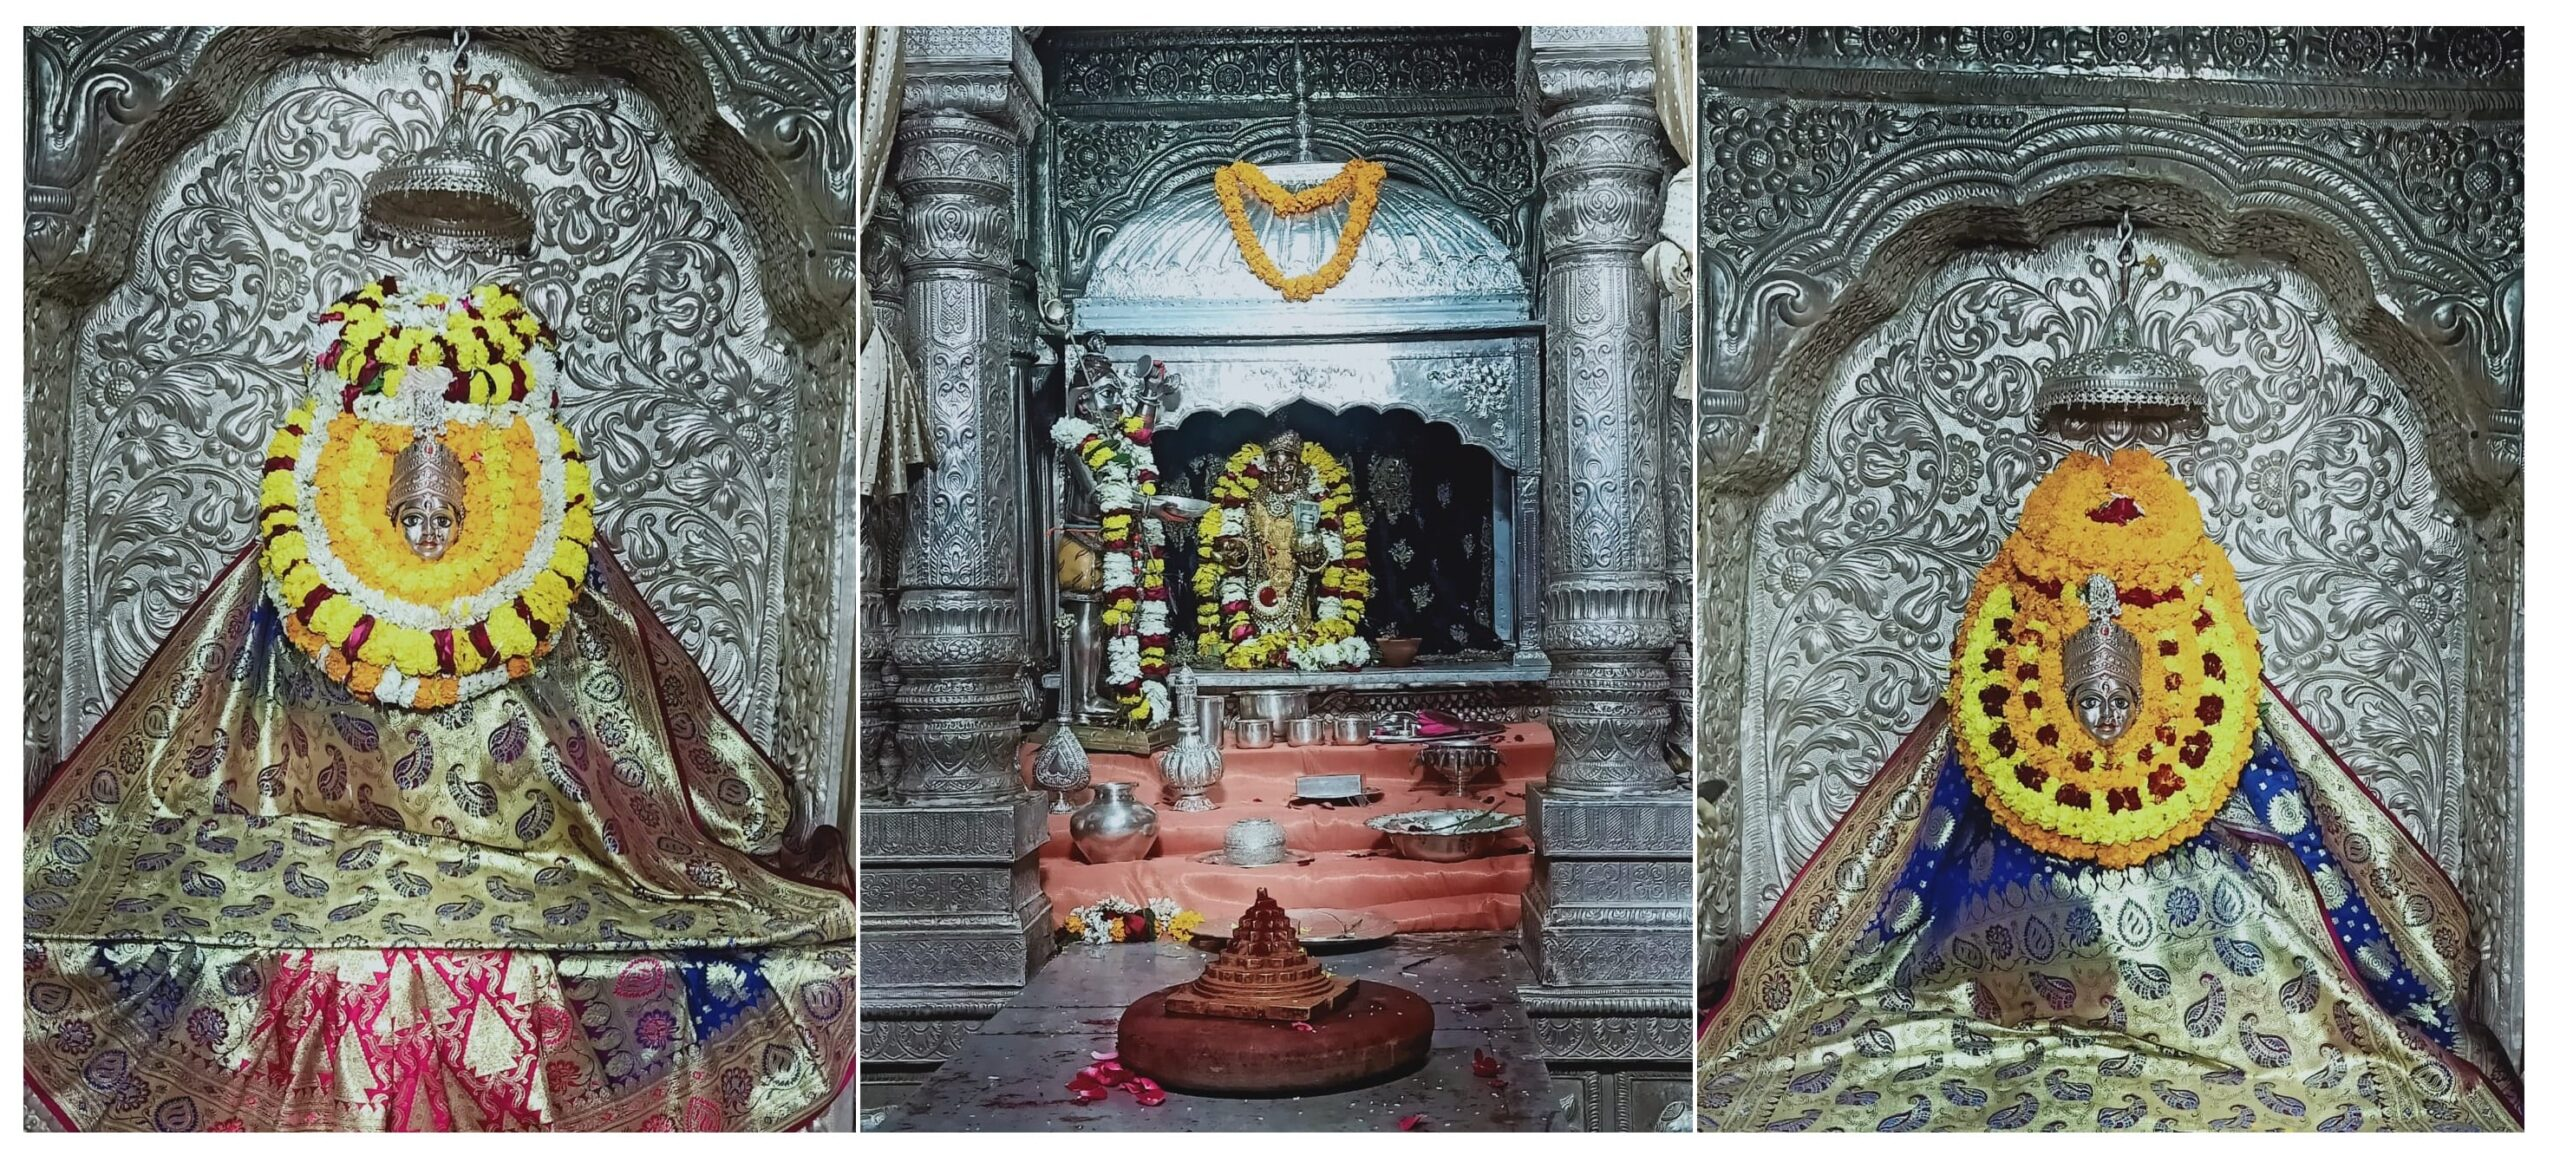 Annapurna Maa at Annapurna Temple Varanasi